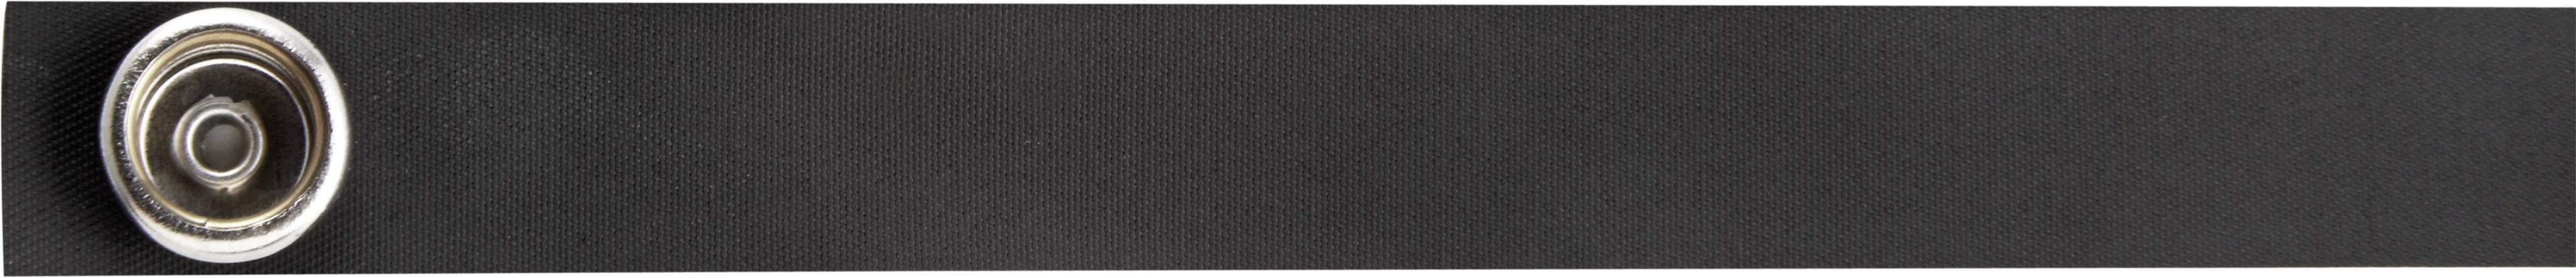 Wolfgang Warmbier 2560.890.R.100, 1 ks, čierna